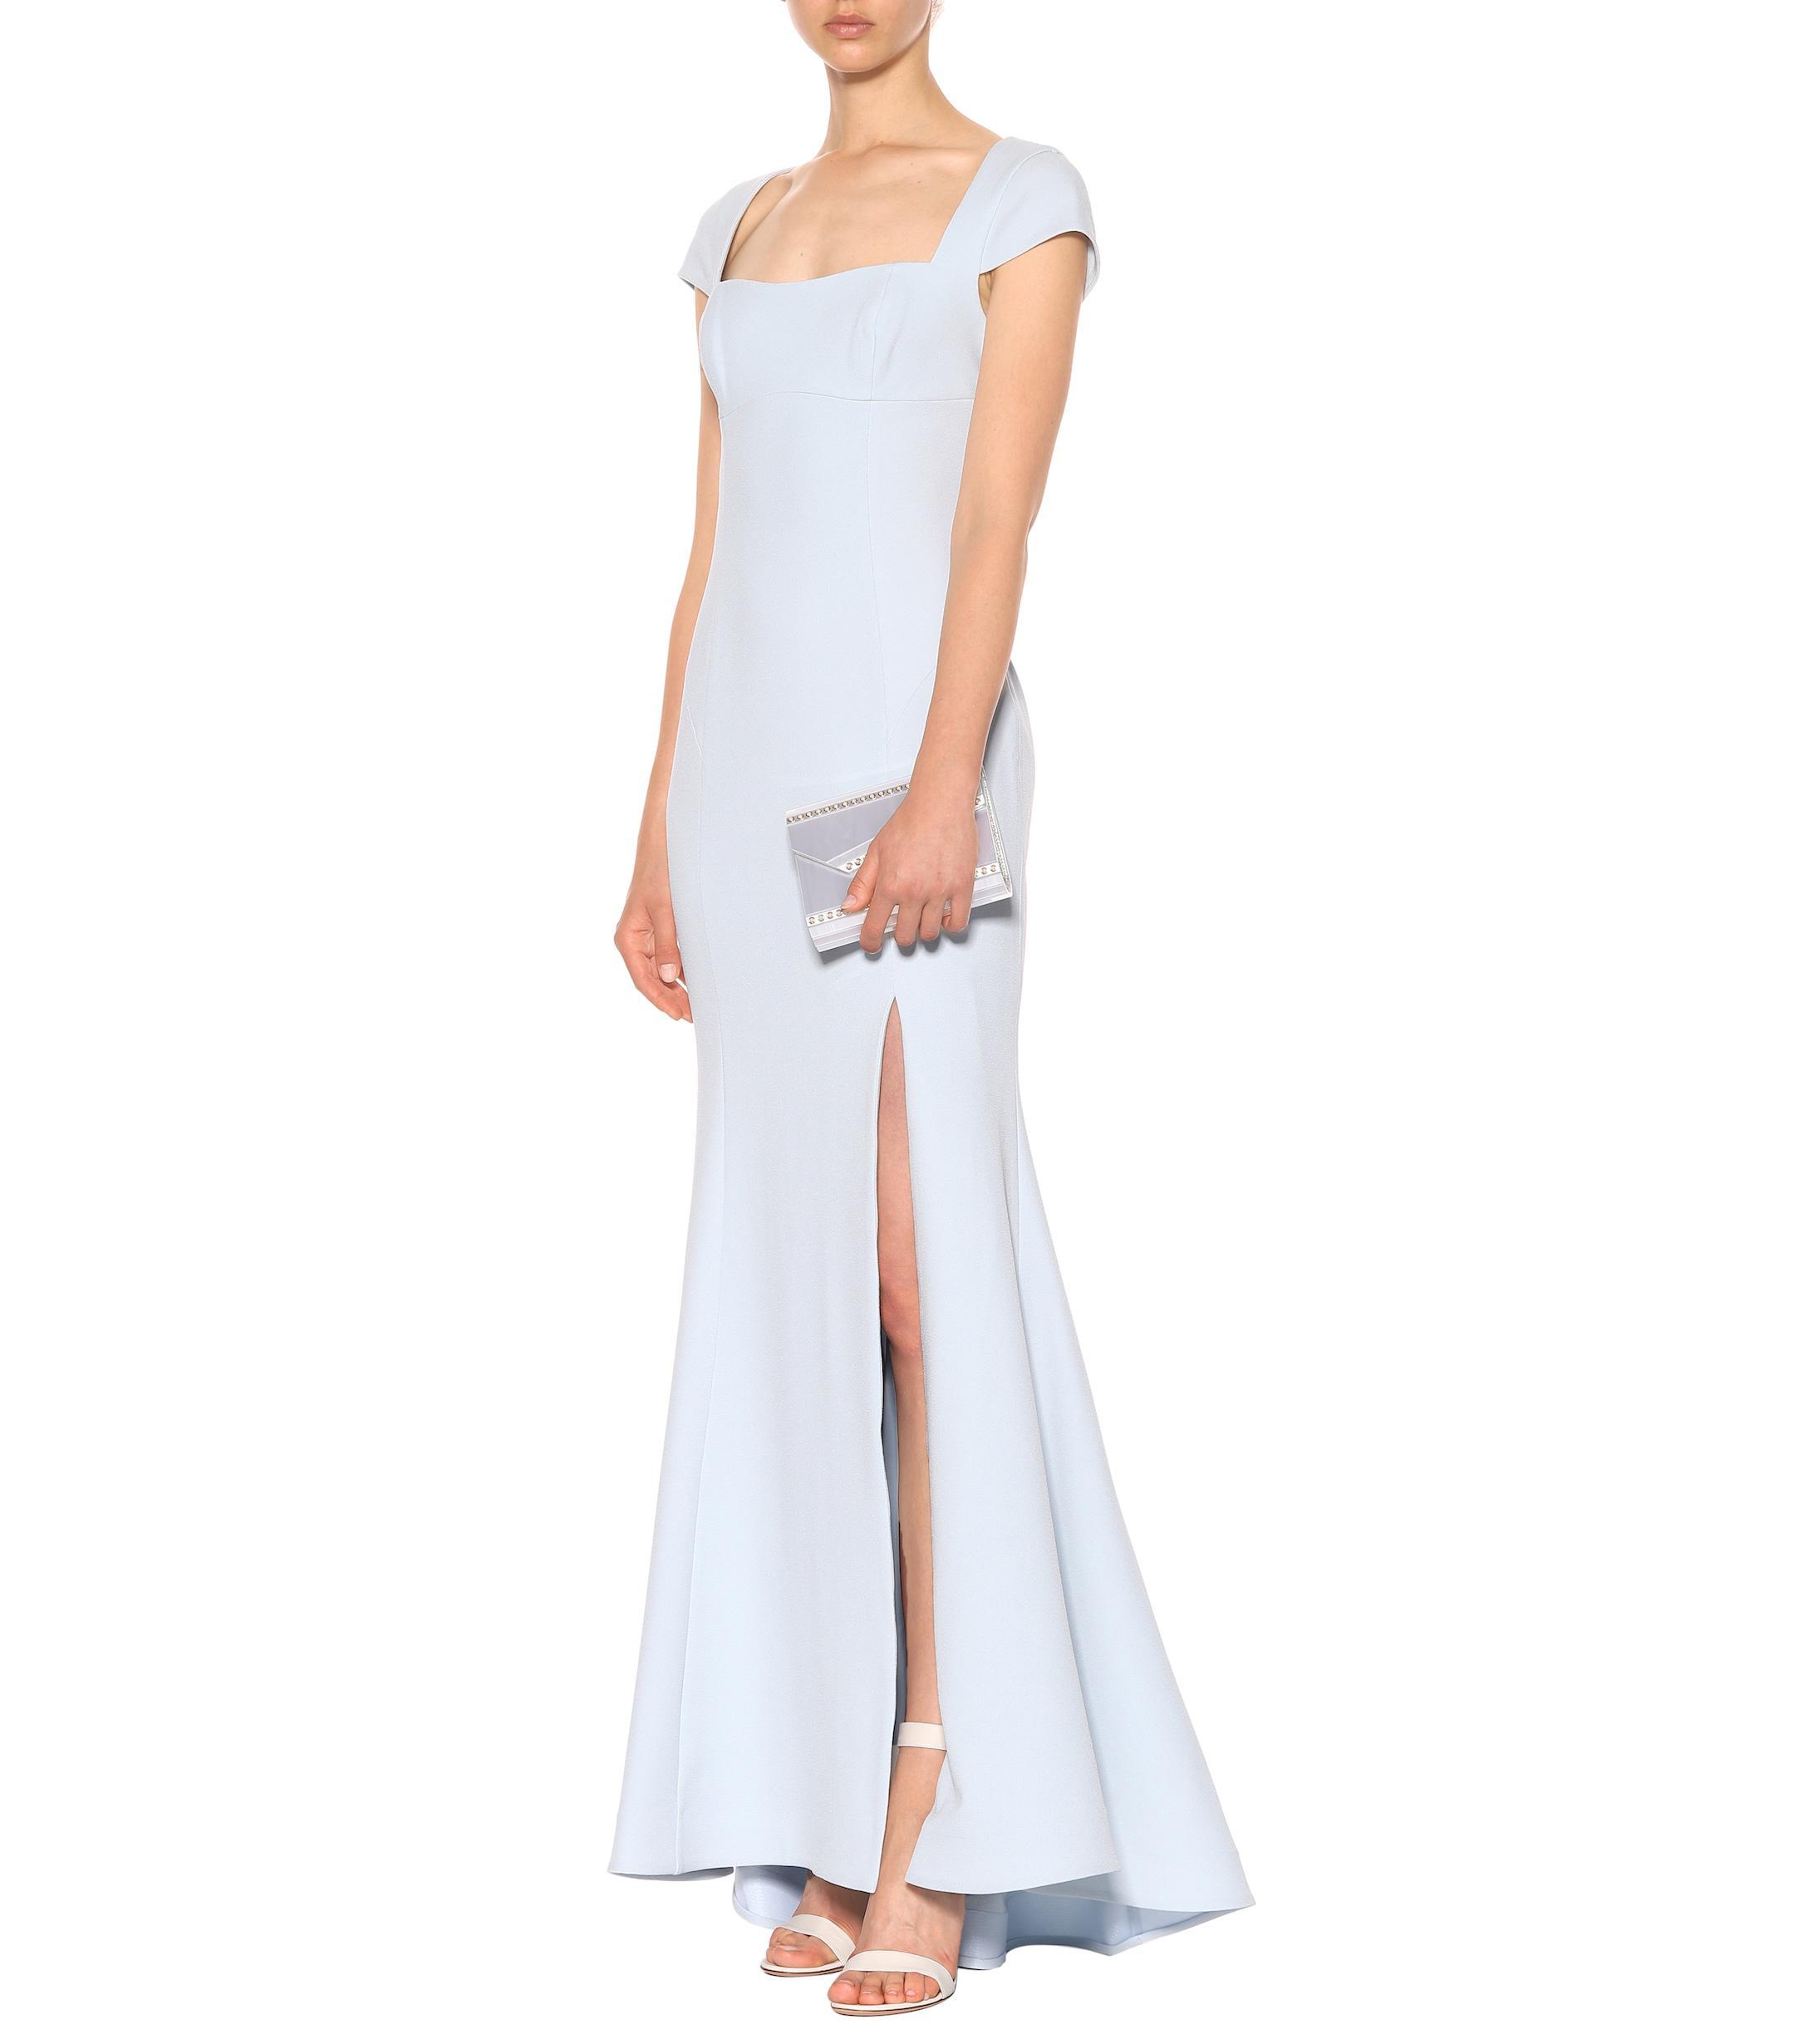 871f75ddc1d735 rebecca-vallance-designer-bay-blue-Cutout-back-Crepe-Gown.jpeg